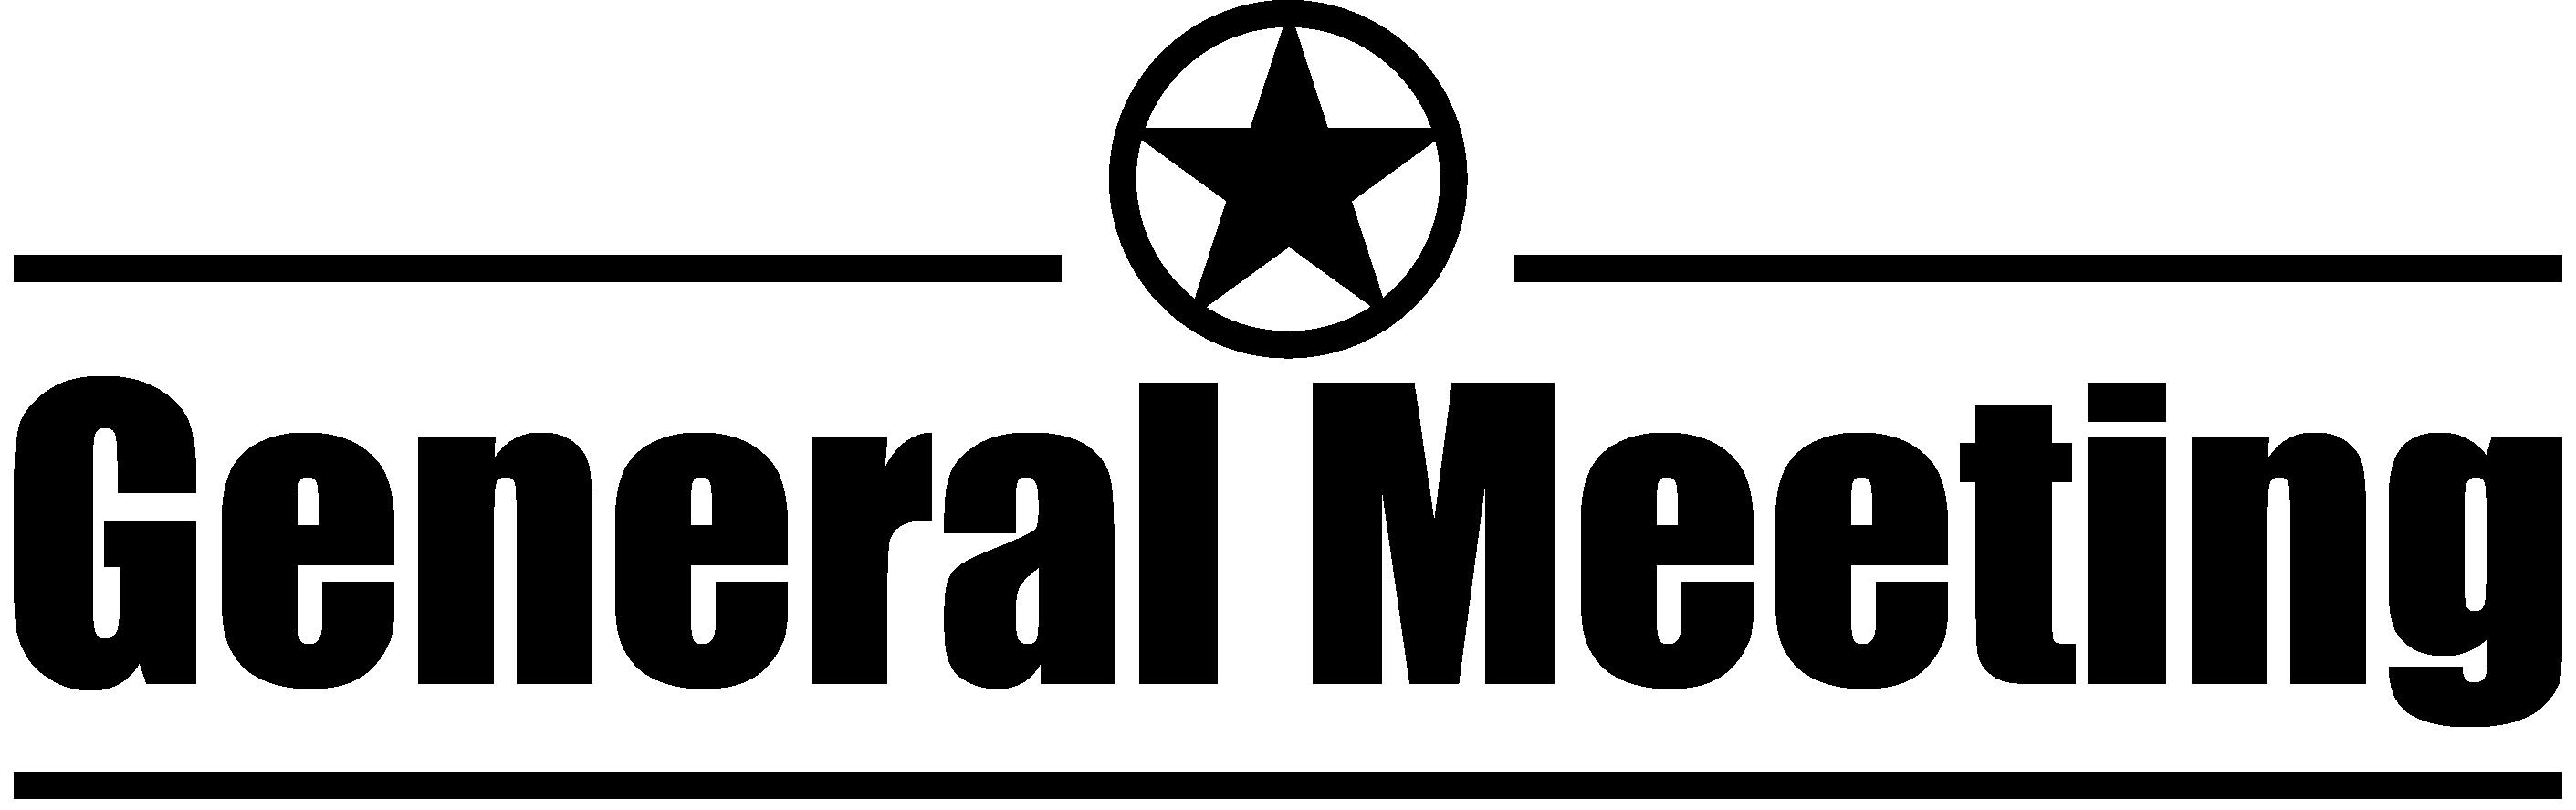 GeneralMeeting (Black)